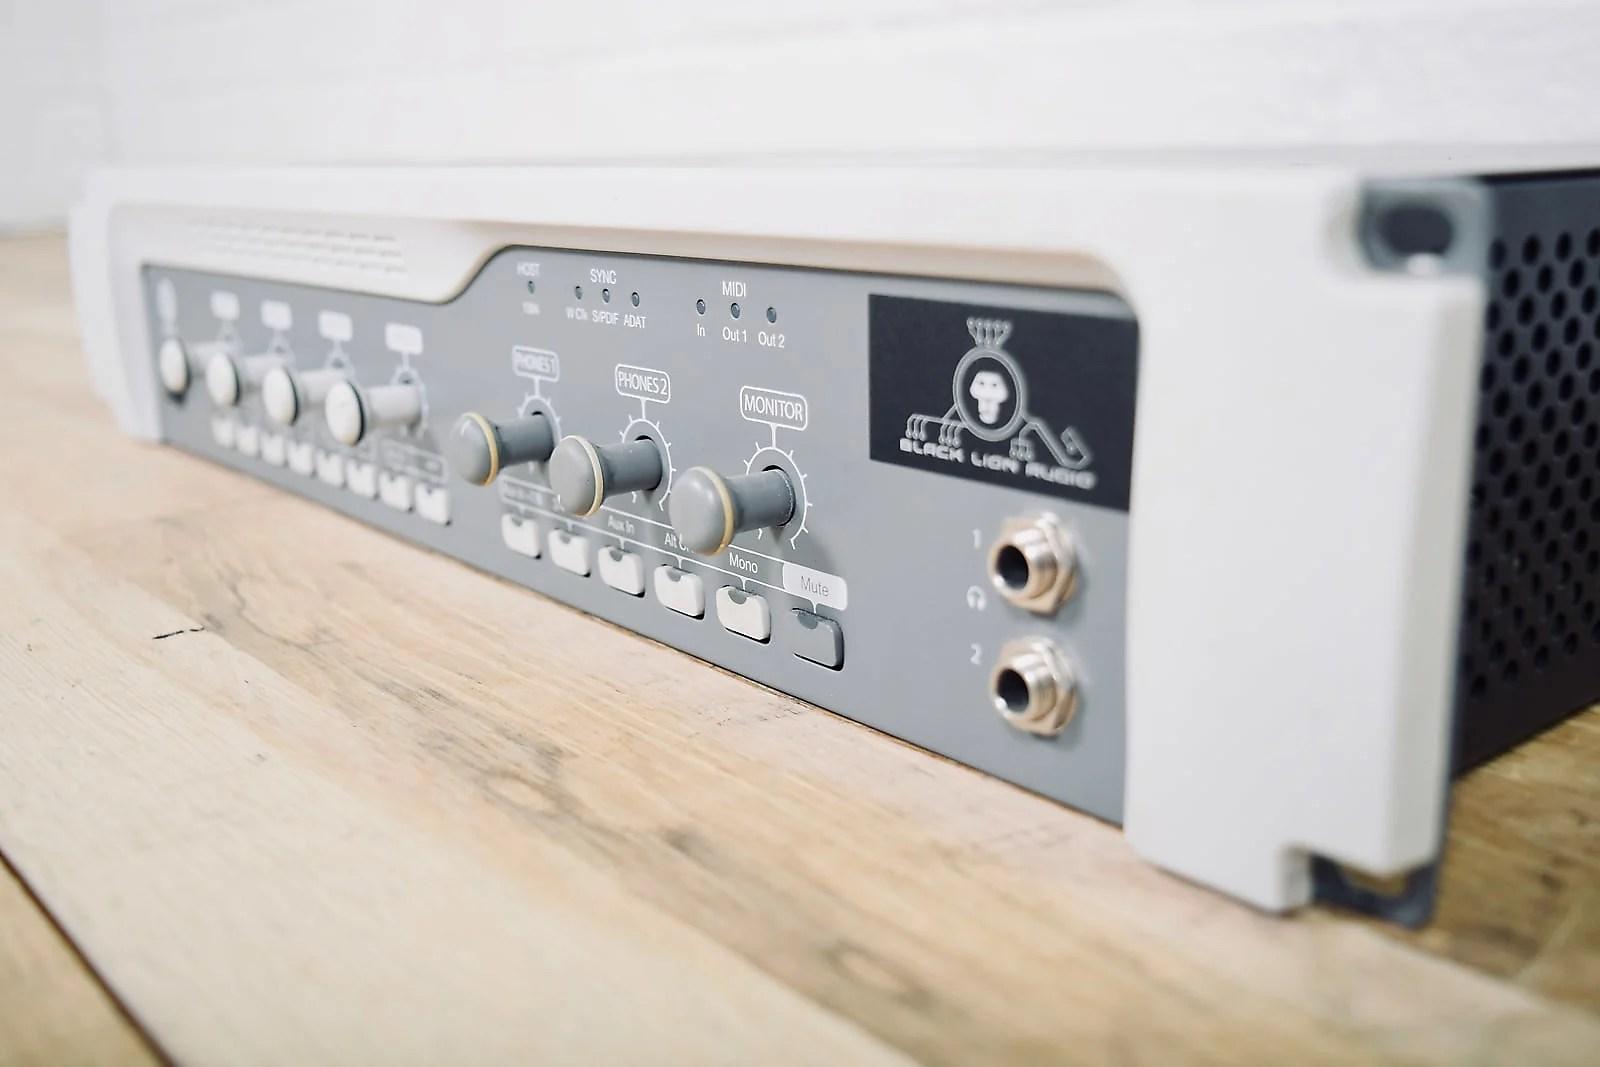 digidesign digi 003 rack with black lion audio signature mod excellent bla unit